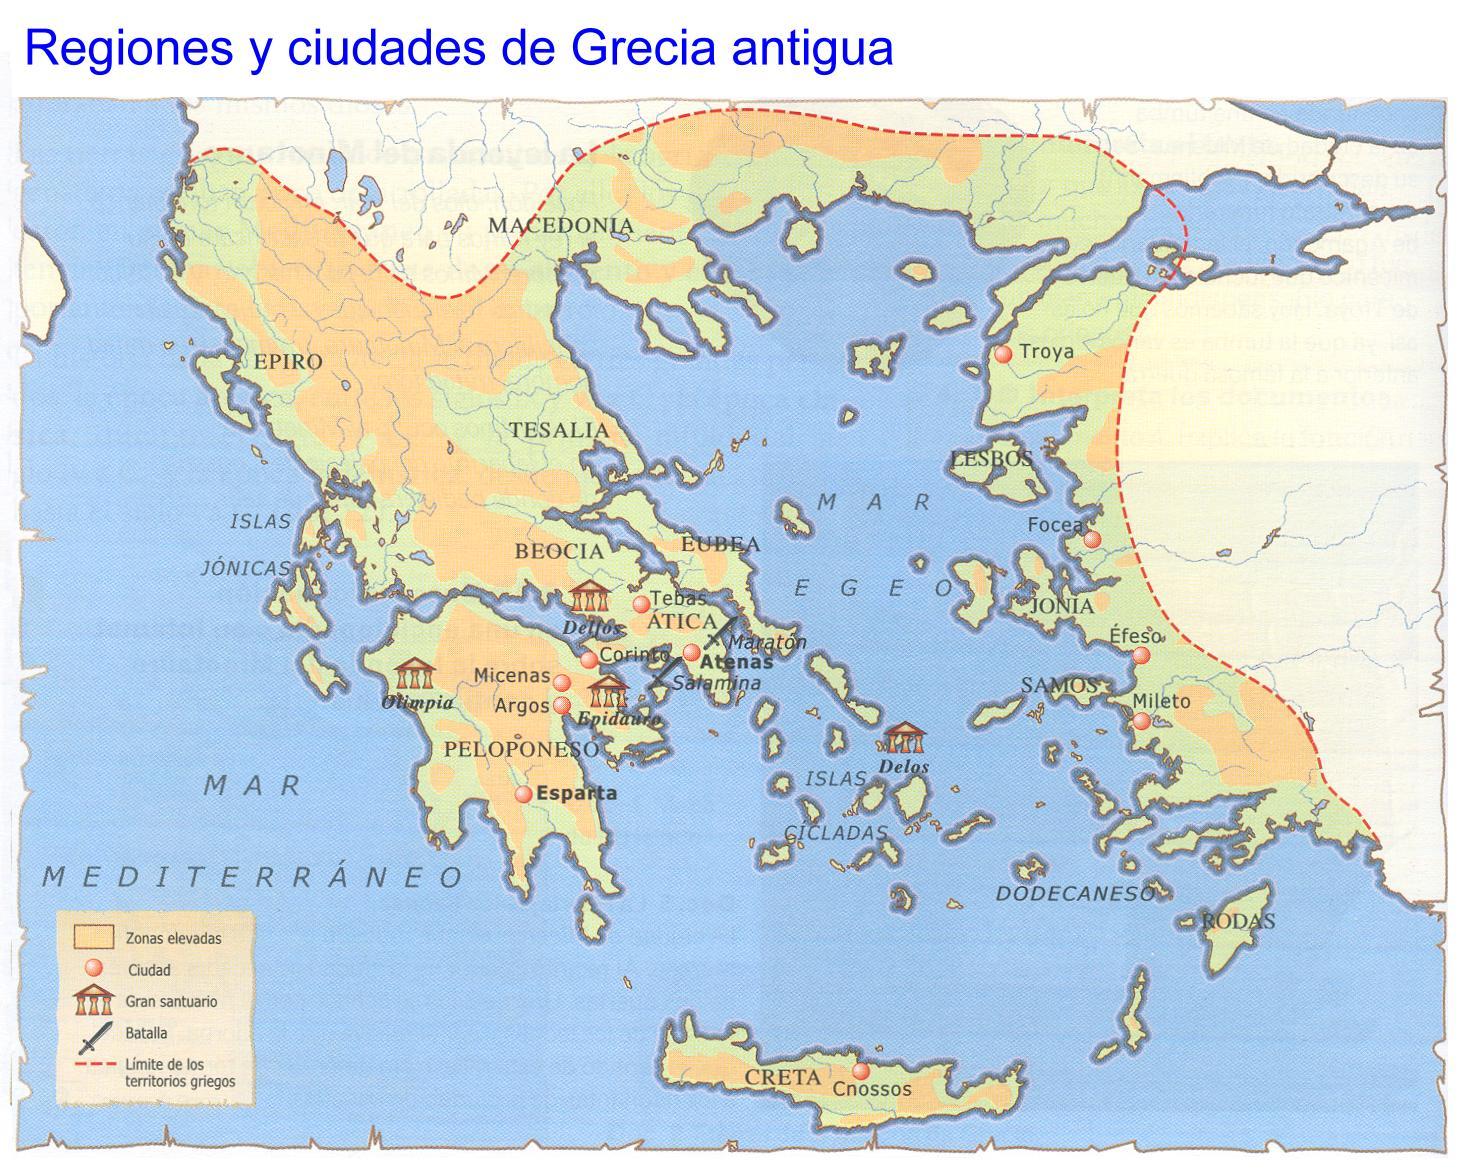 la geografia de grecia: